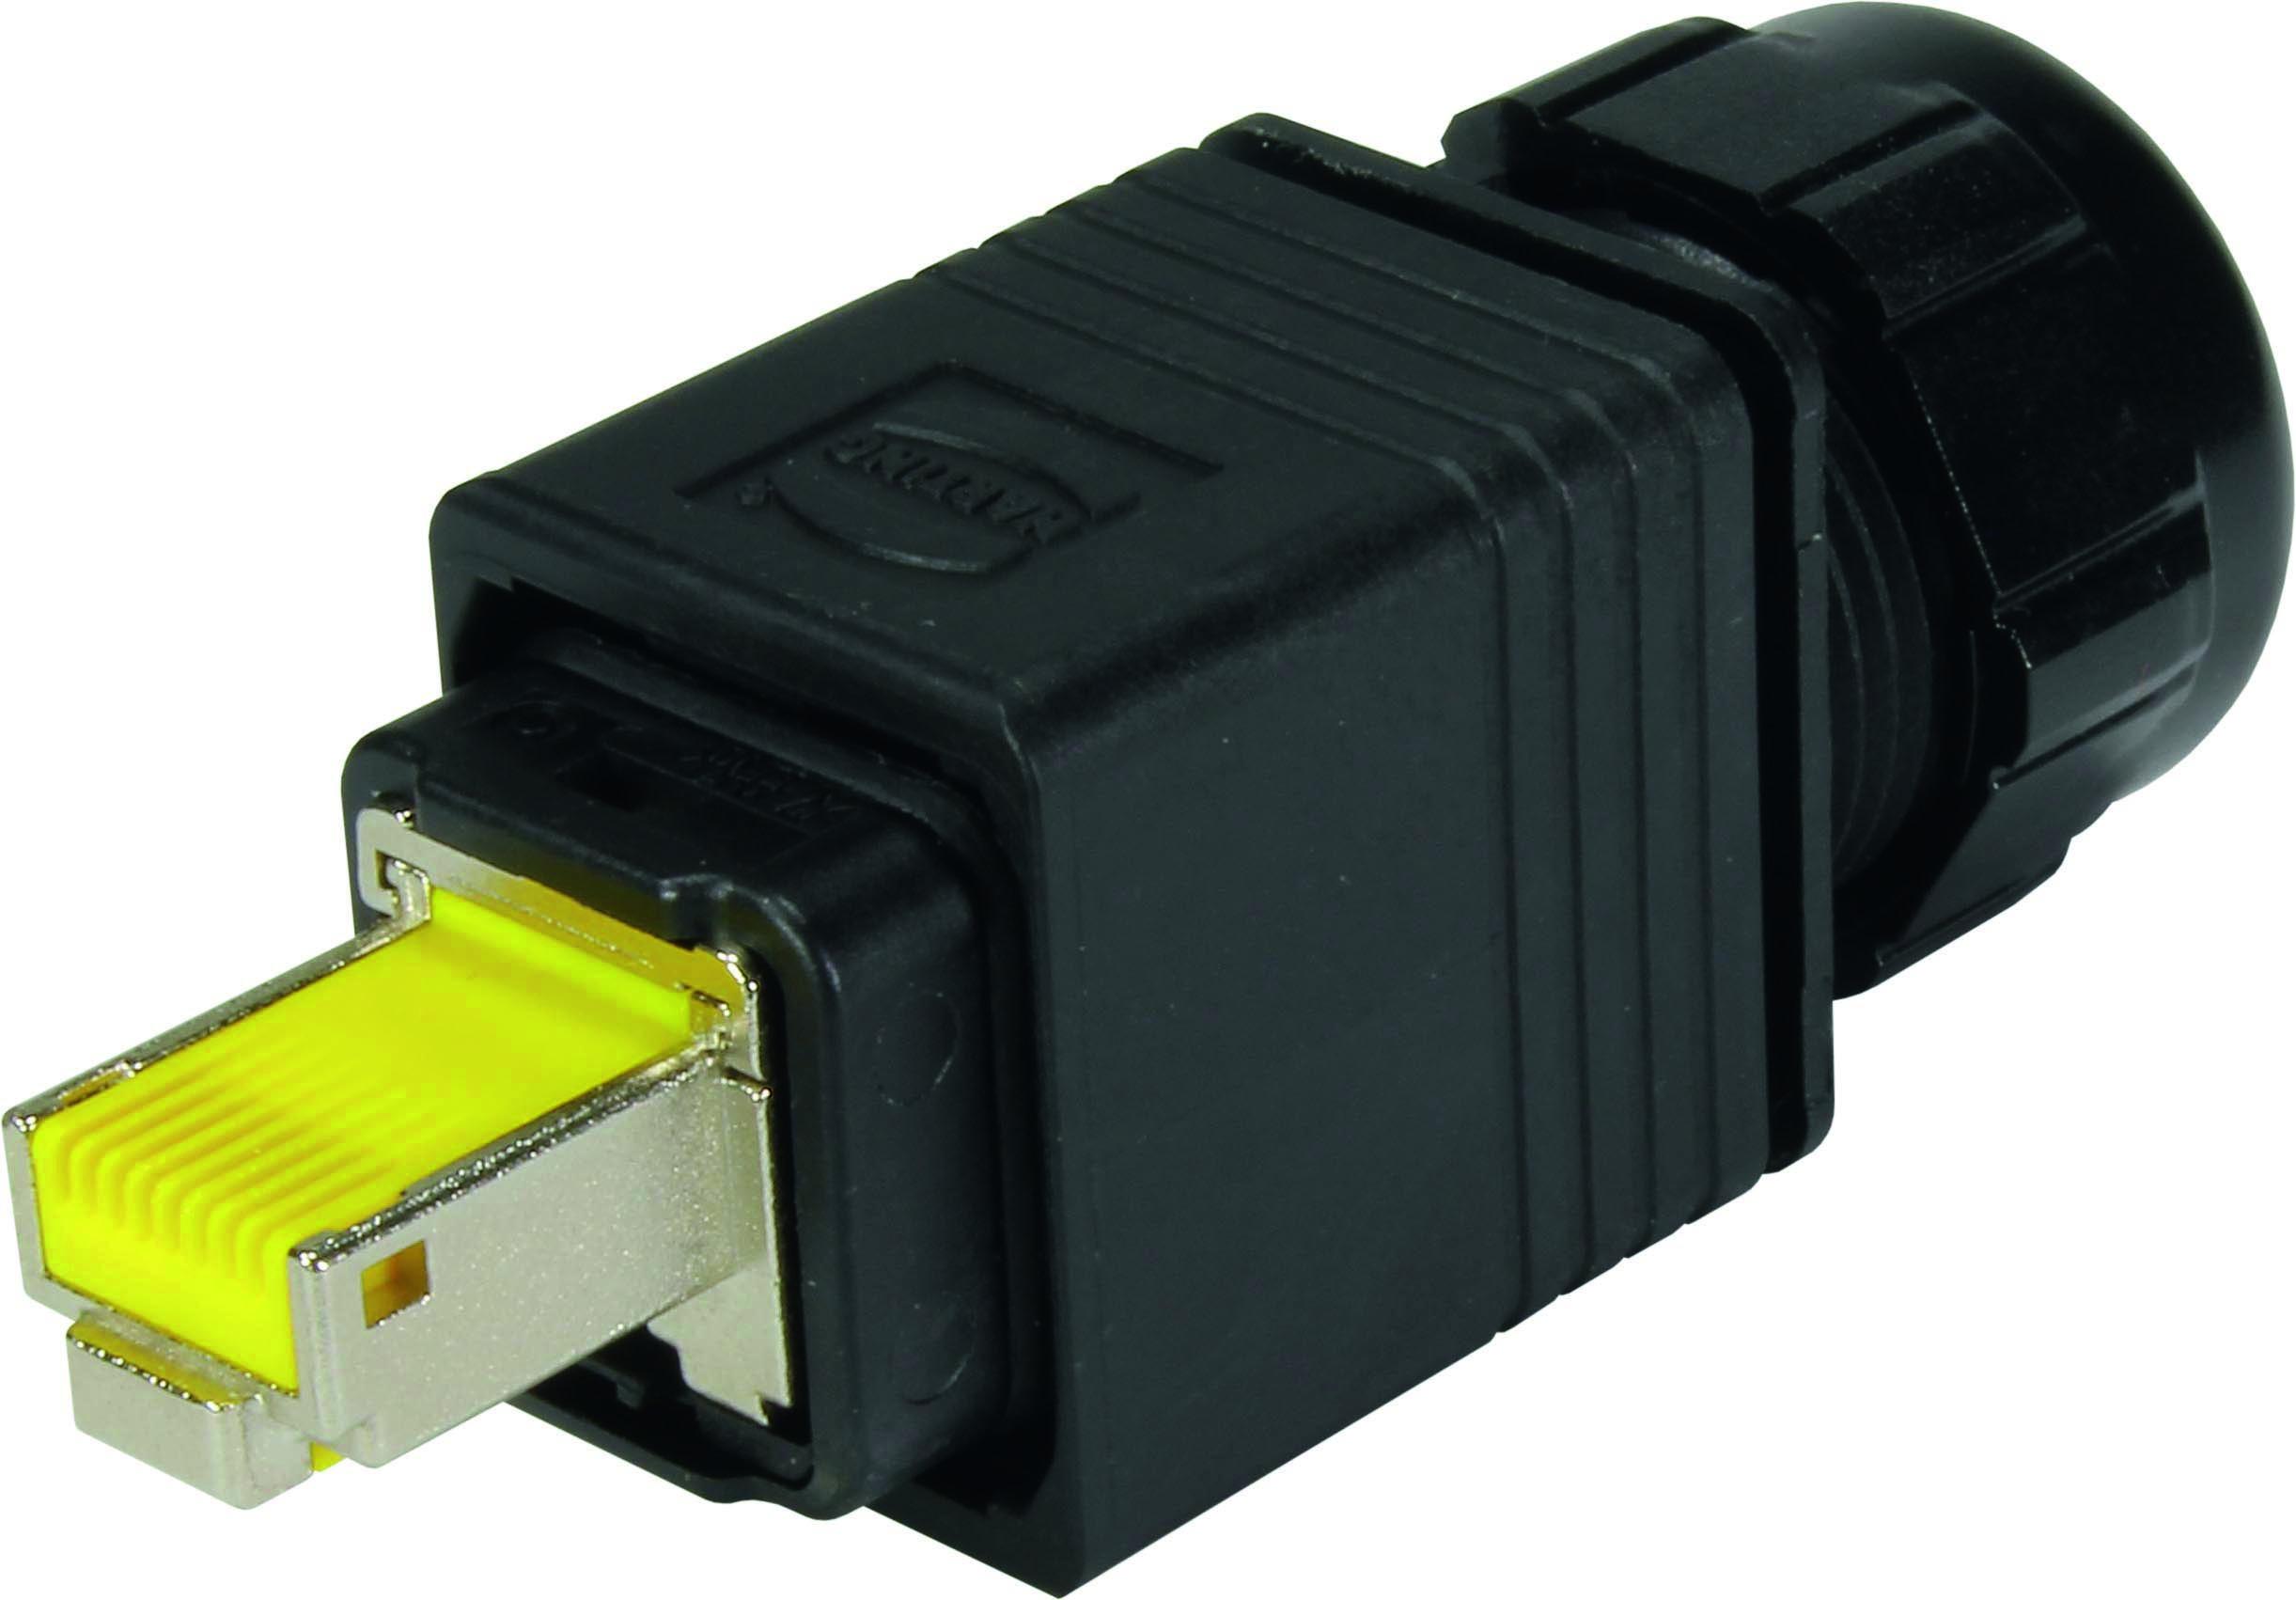 1 Stk WireXpert - RJ45 push-pull V14 Stecker für preLink® System HMSWXZC07-